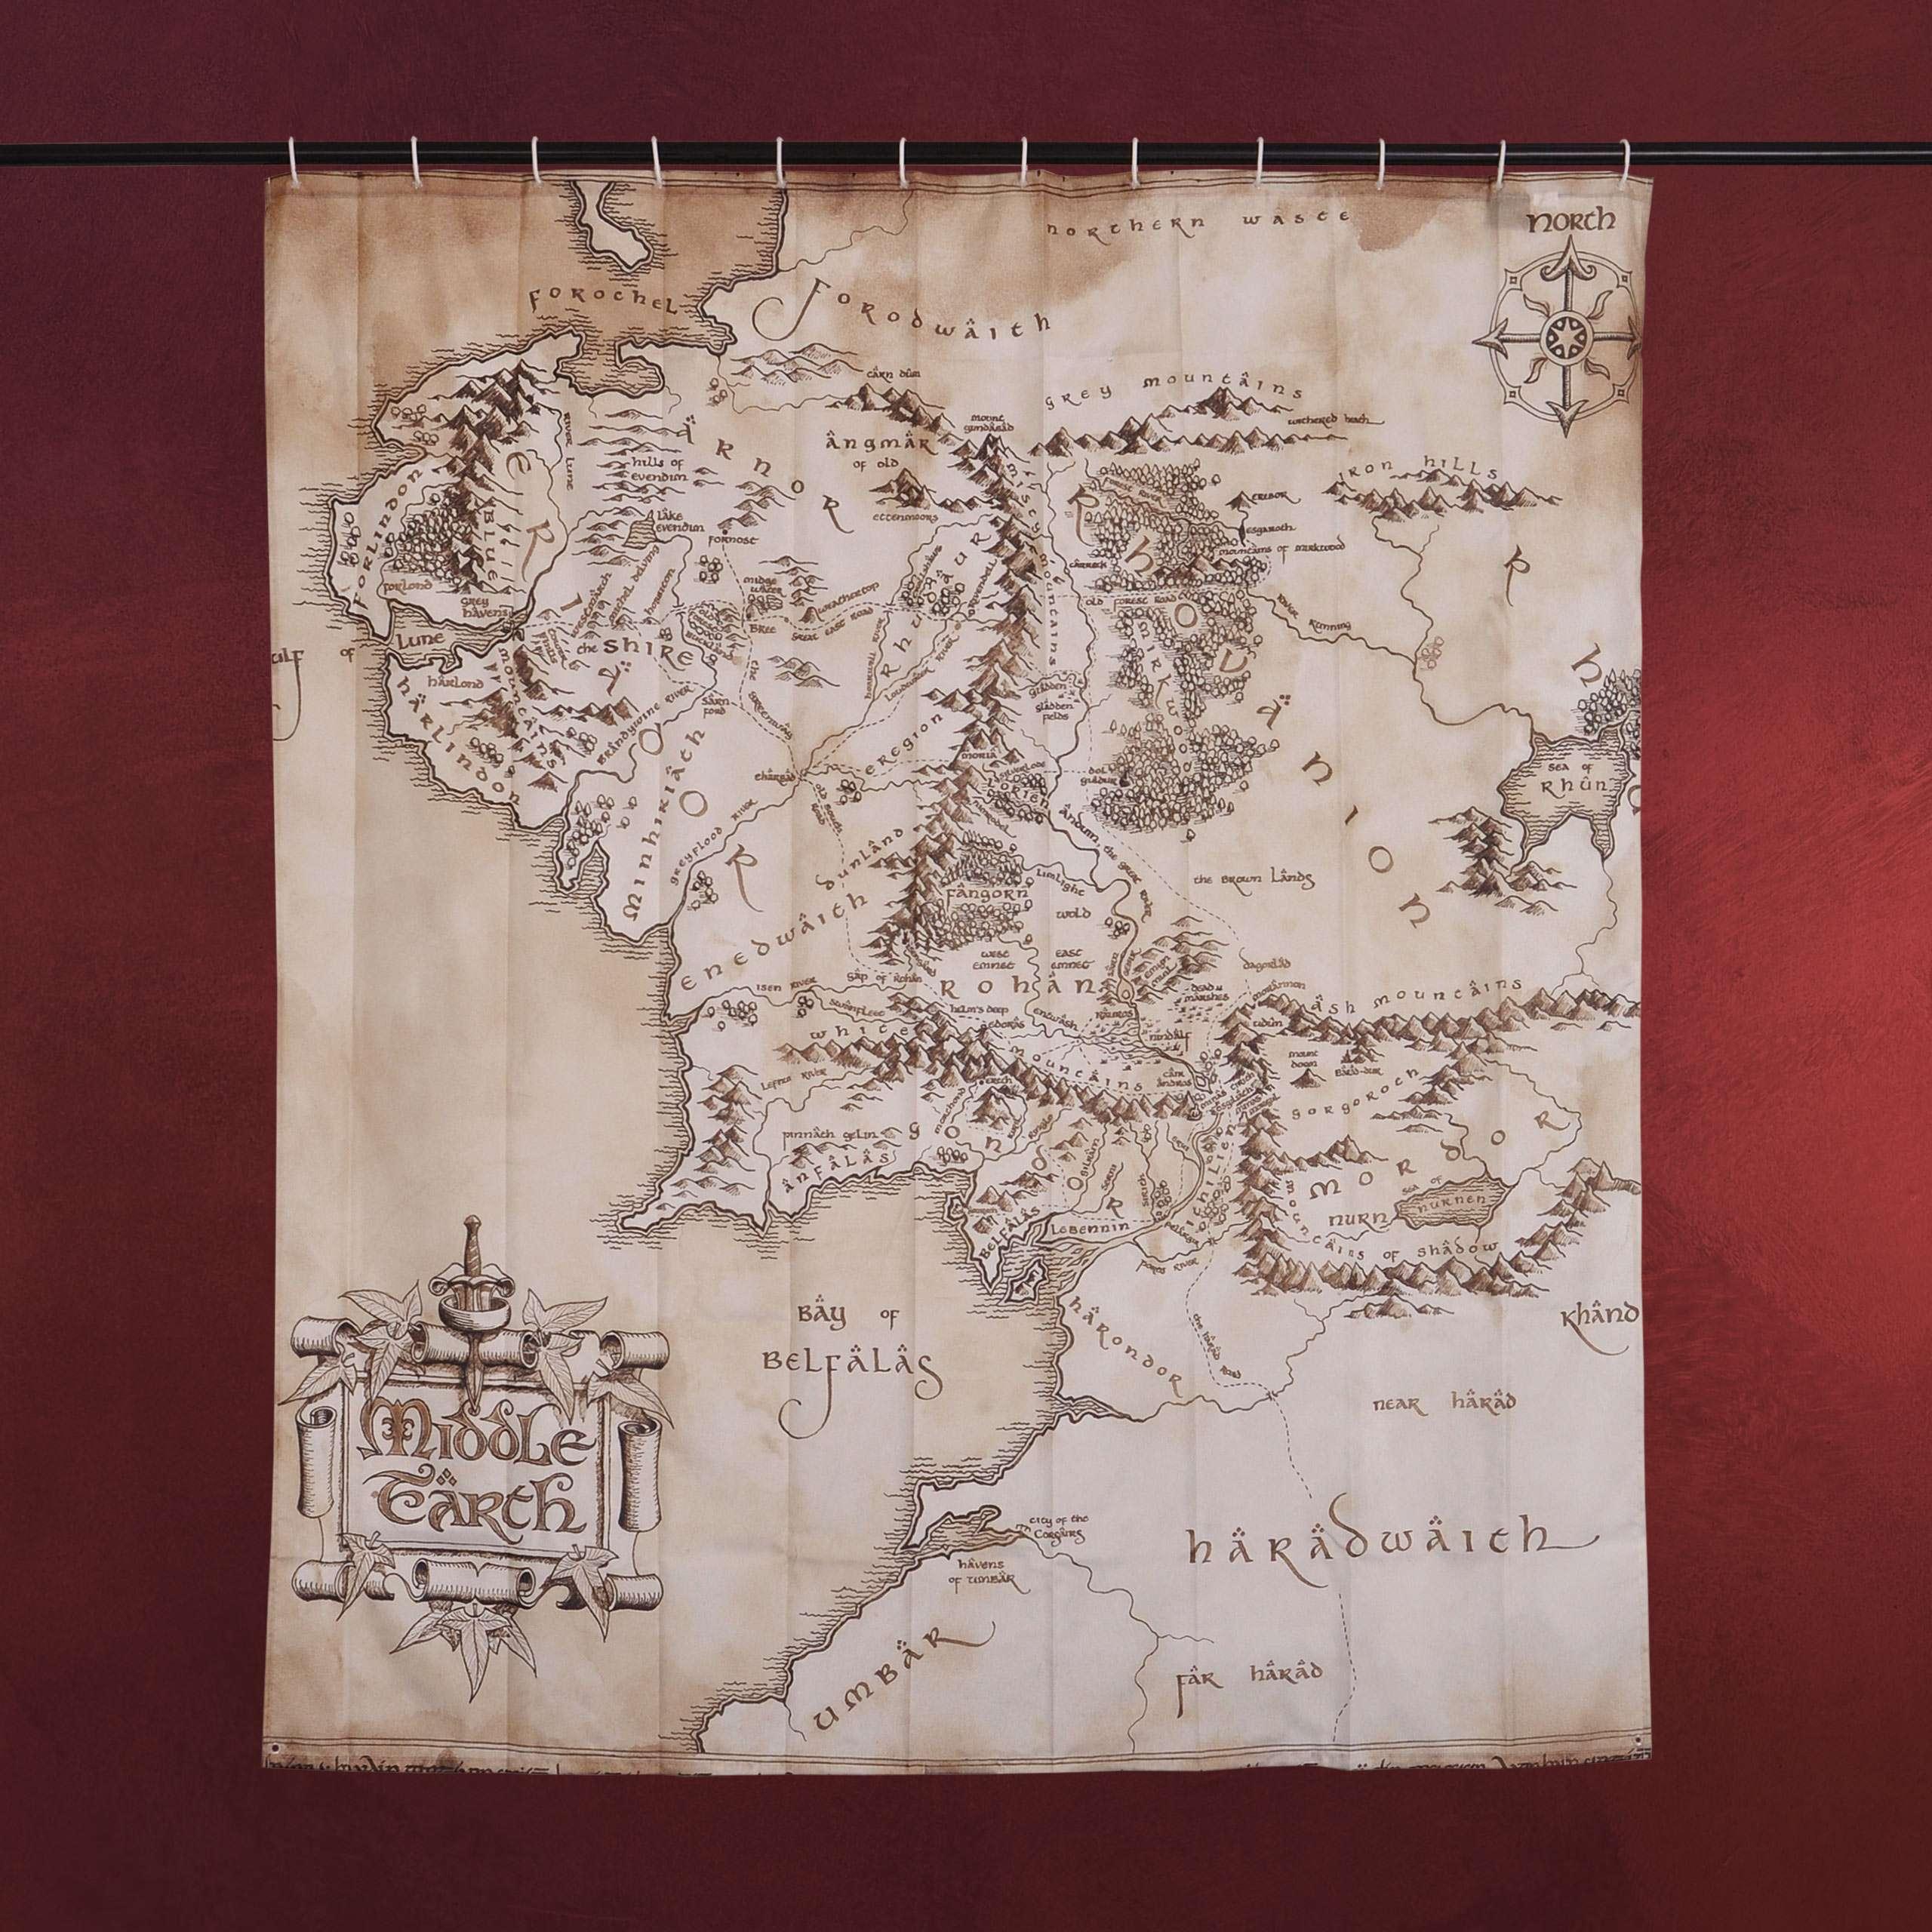 Mittelerde Karte 4k.Herr Der Ringe Mittelerde Karte Duschvorhang